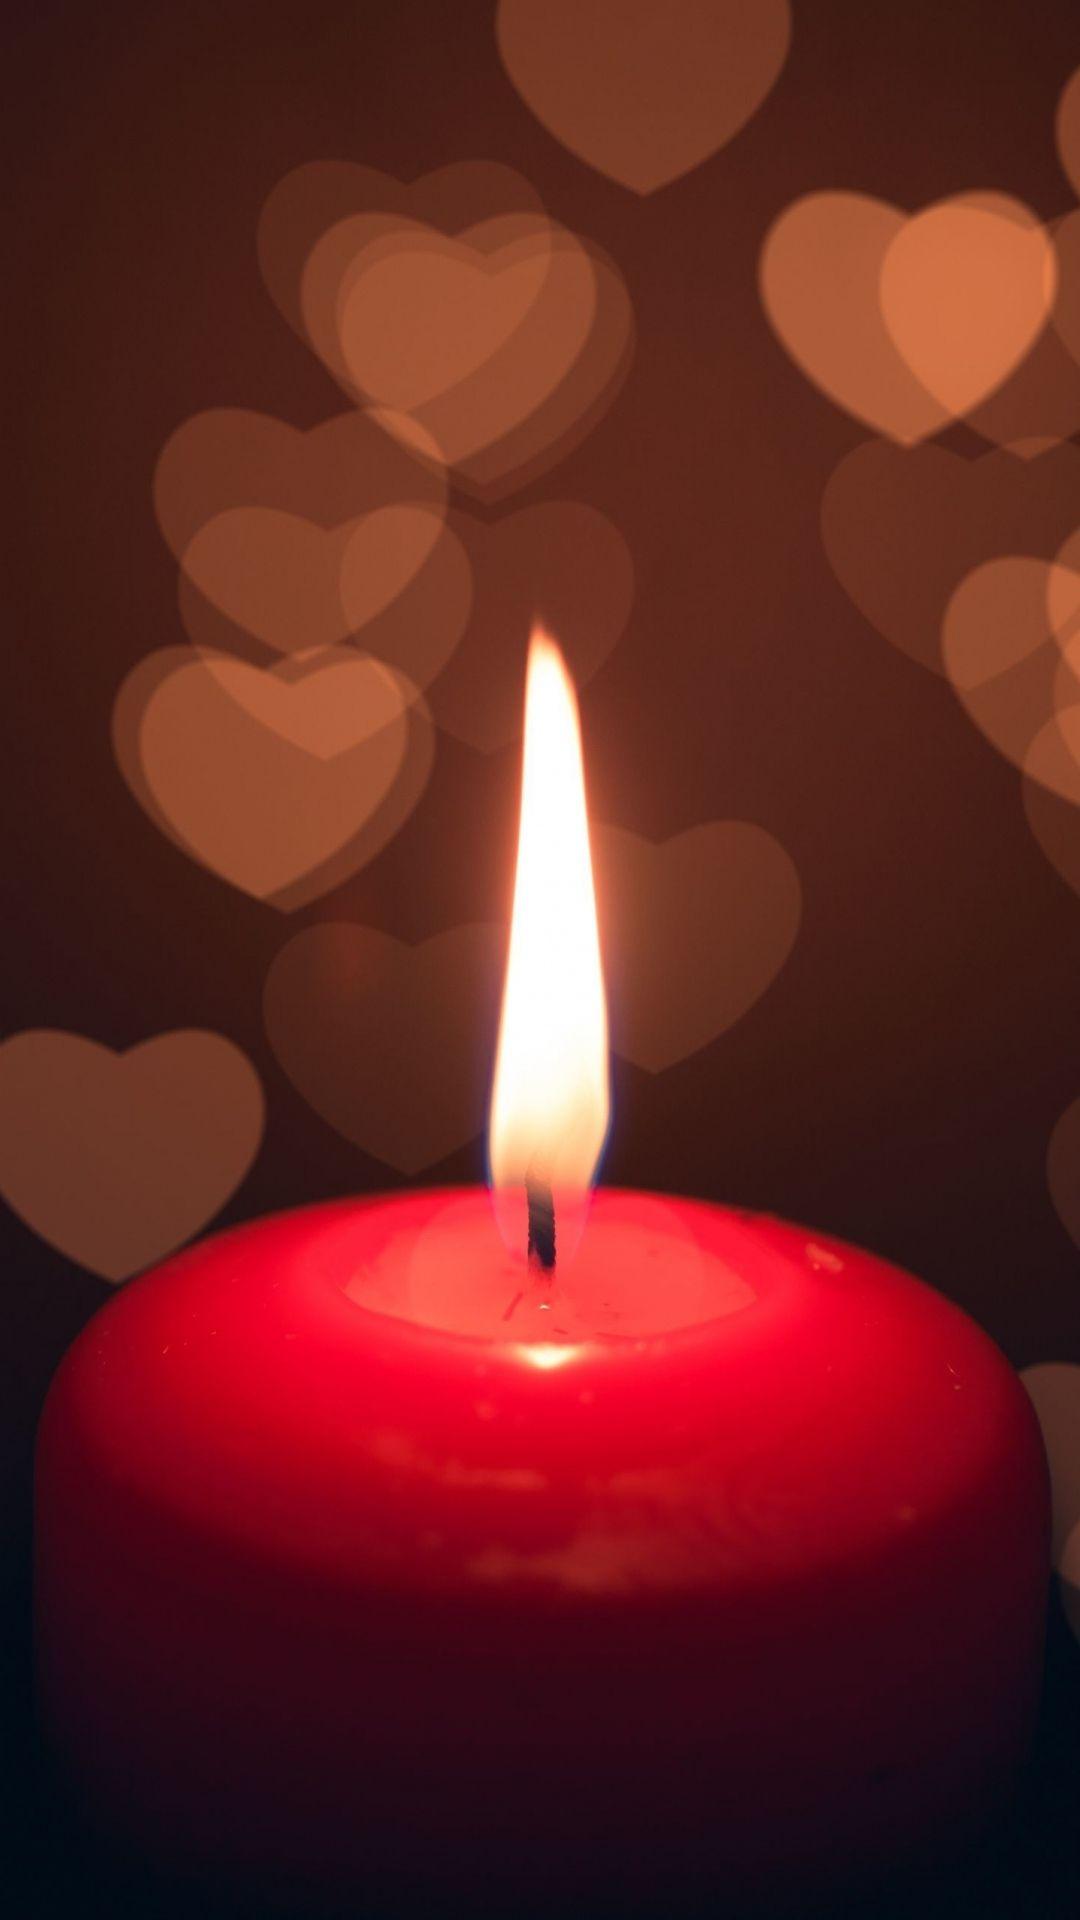 Candle Heart Dark IPhone 6 Plus Wallpaper Lit Iphone